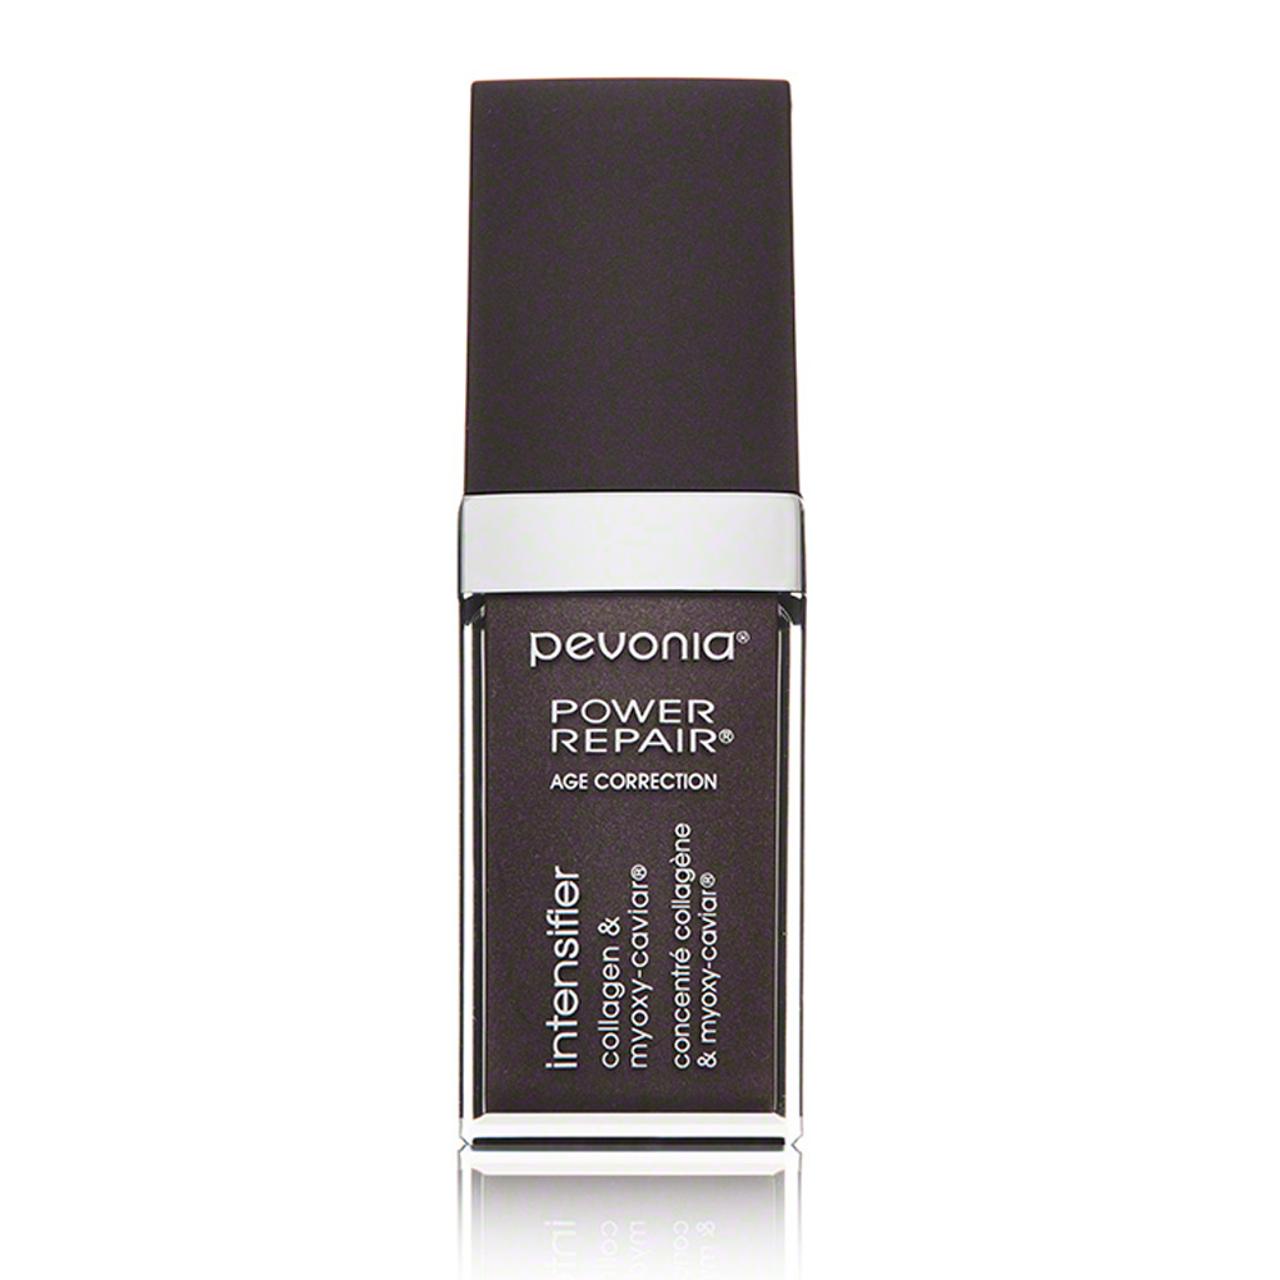 Pevonia Power Repair Intensifier - Collagen & Myoxy-Caviar